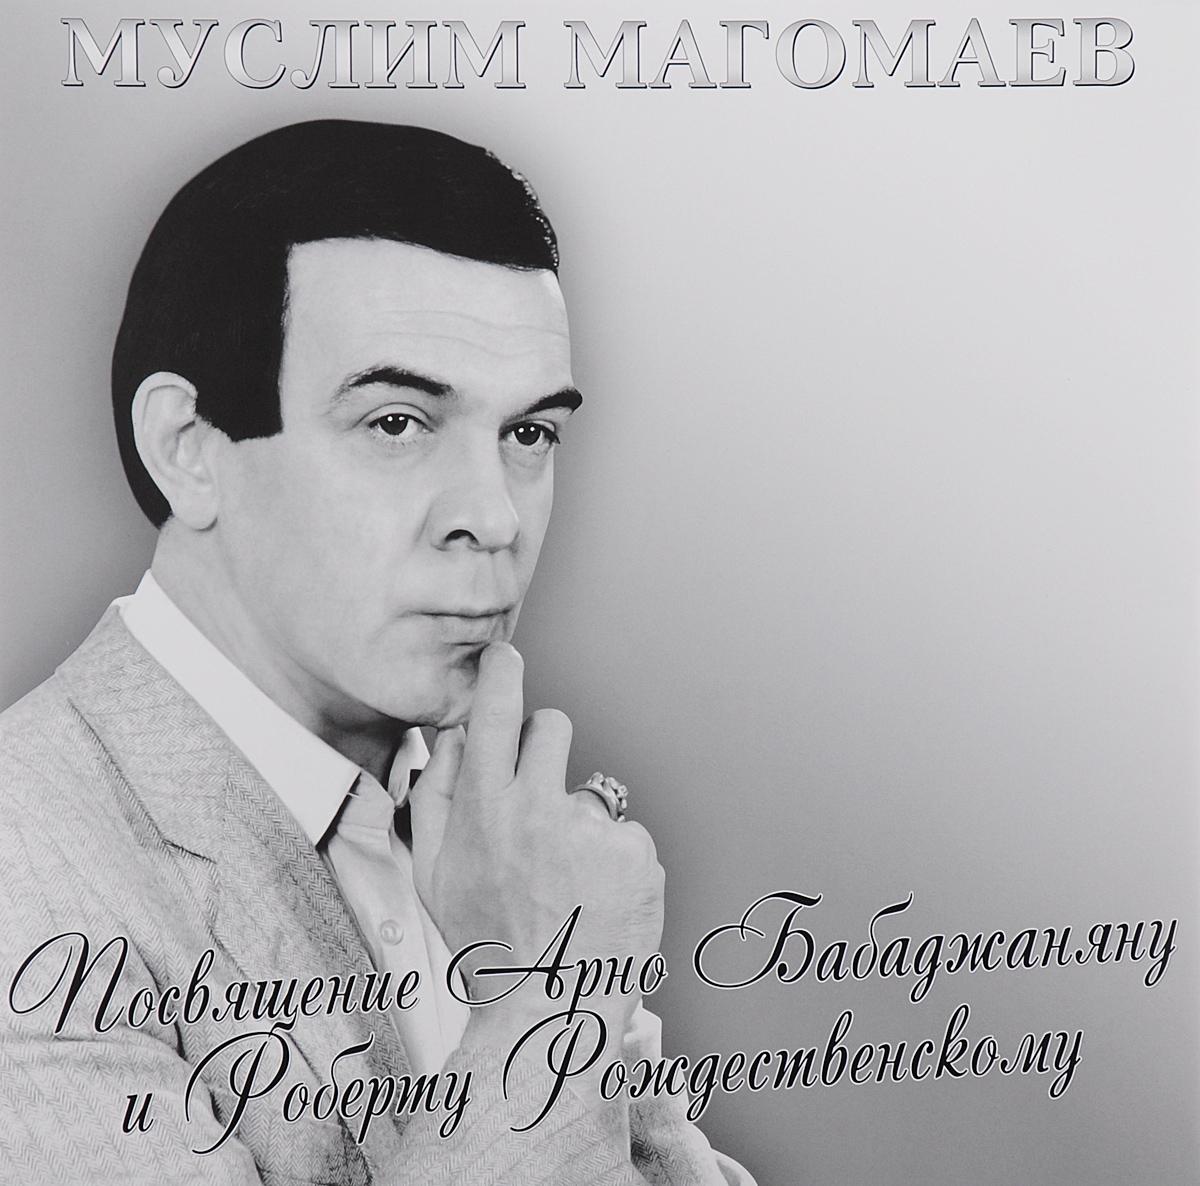 Муслим Магомаев Муслим Магомаев. Посвящение Арно Бабаджаняну и Роберту Рождественскому (LP) муслим магомаев муслим магомаев ты моя мелодия lp